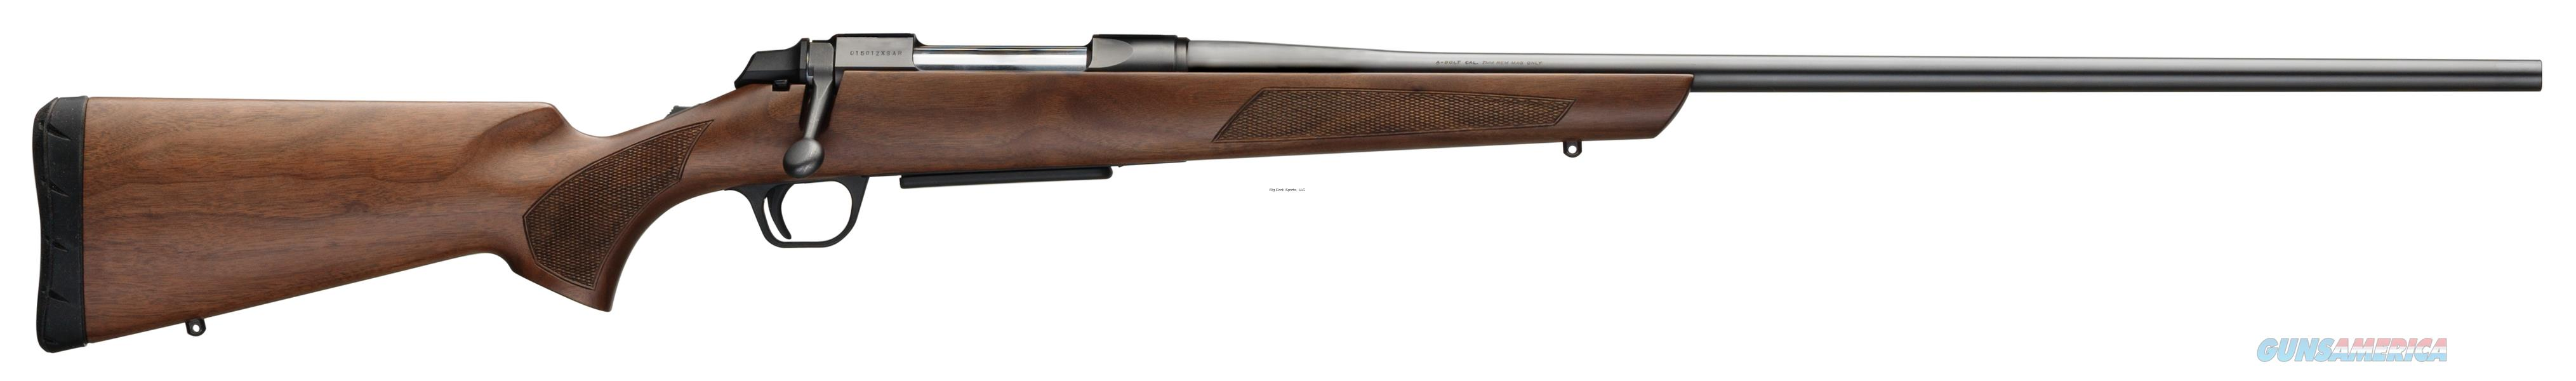 Browning A-Bolt Iii Hunter Bolt Action Rifle 300 Win, Rh, 26 In, Blue, Wood Stk, 3+1 Rnd, Standard Trgr 035801229  Guns > Rifles > B Misc Rifles